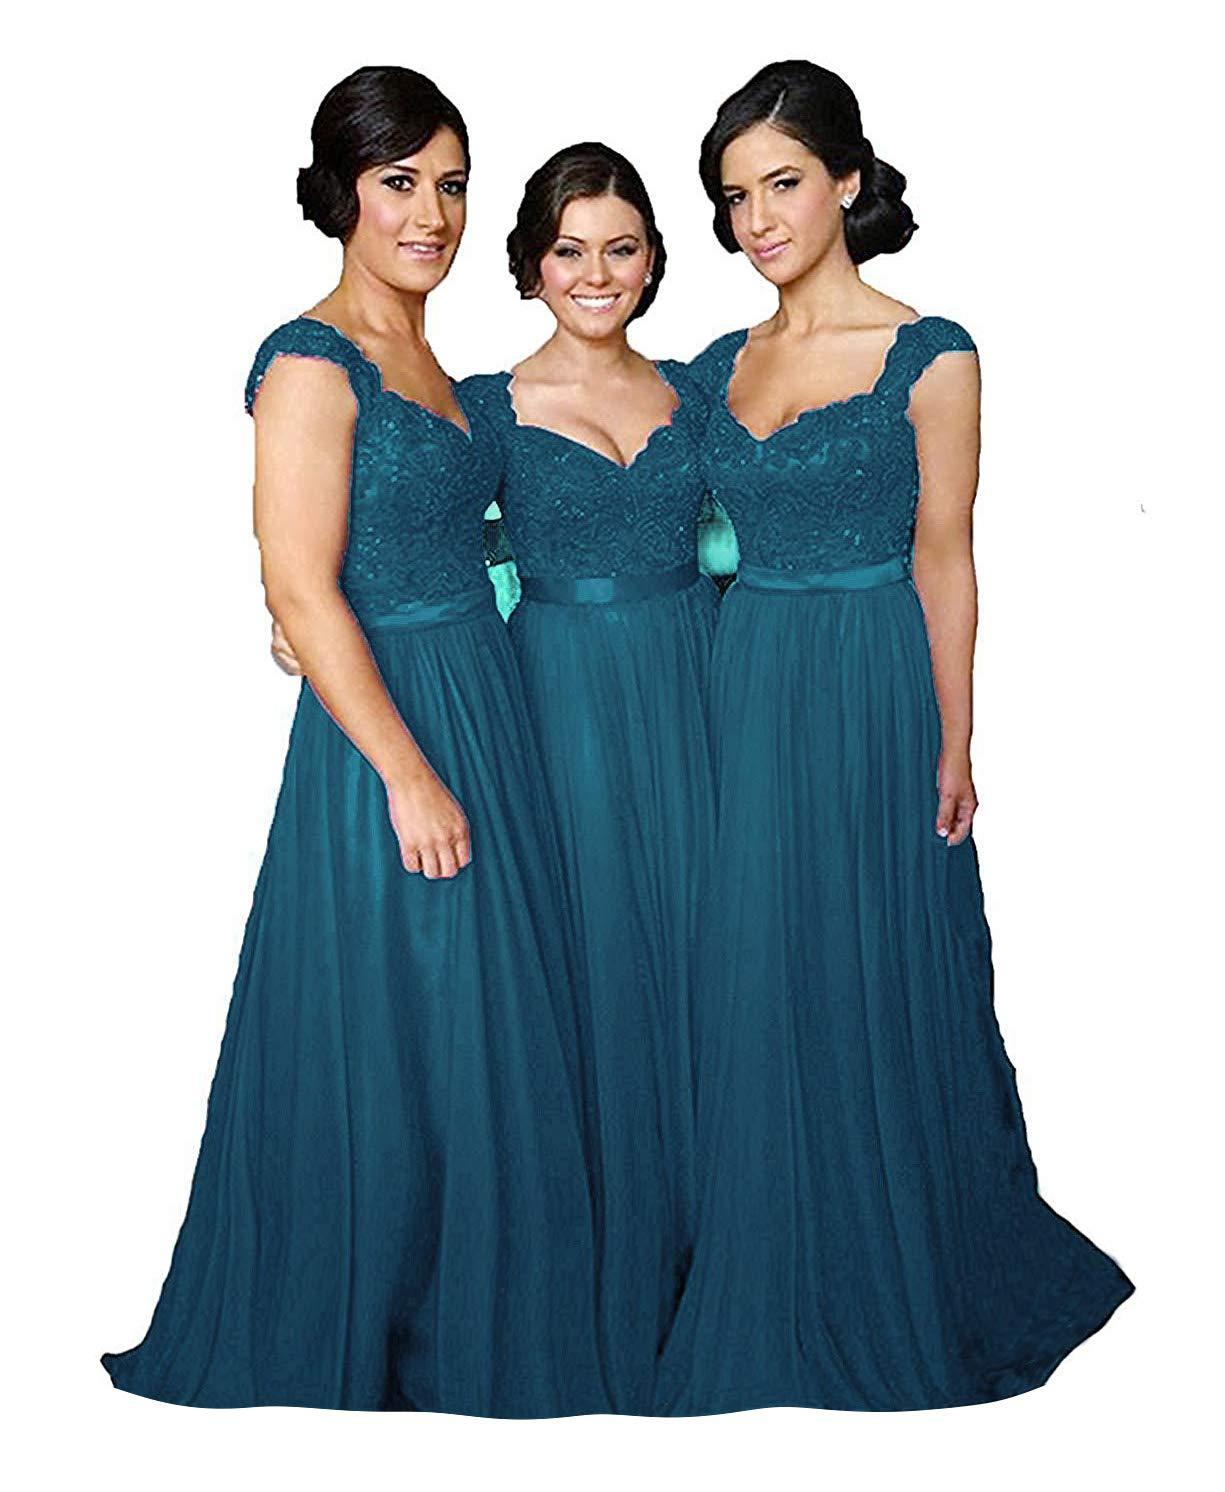 Fanciest Women Cap Sleeve Lace Bridesmaid Dresses Long Wedding Party Gowns Teal Us26w